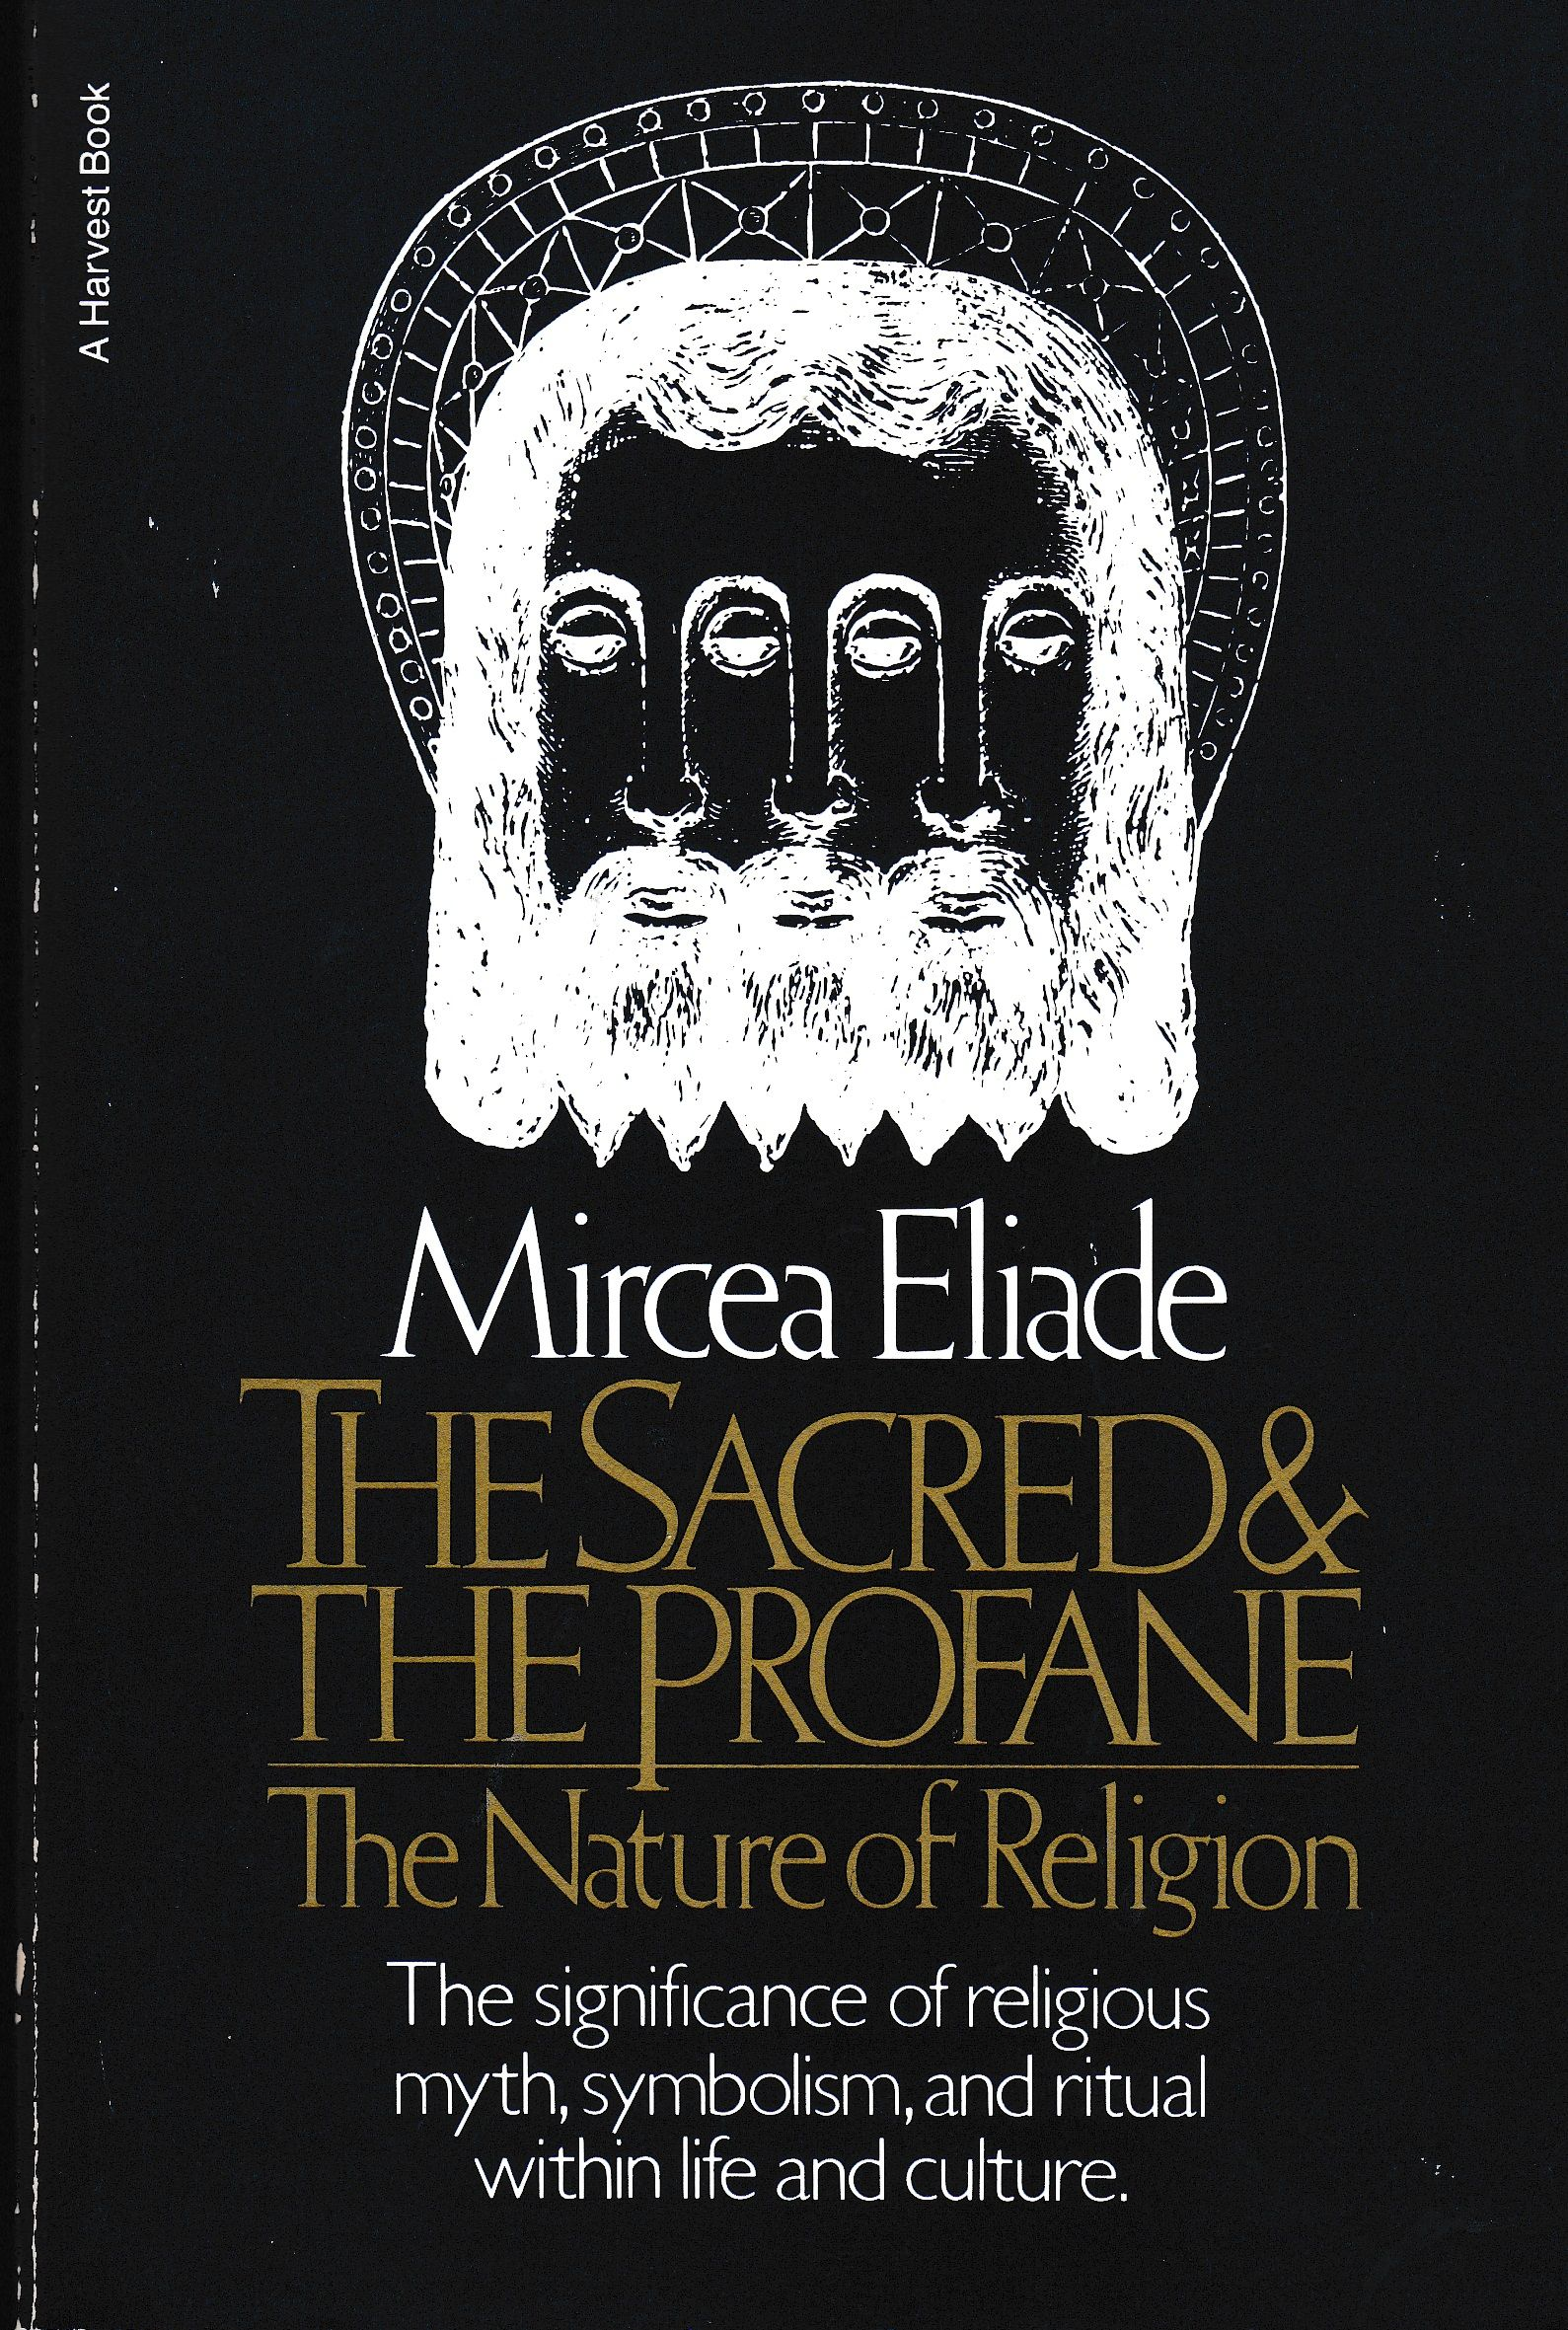 Mircea eliade the sacred and the profane the nature of religion mircea eliade the sacred and the profane the nature of religion 1957 buycottarizona